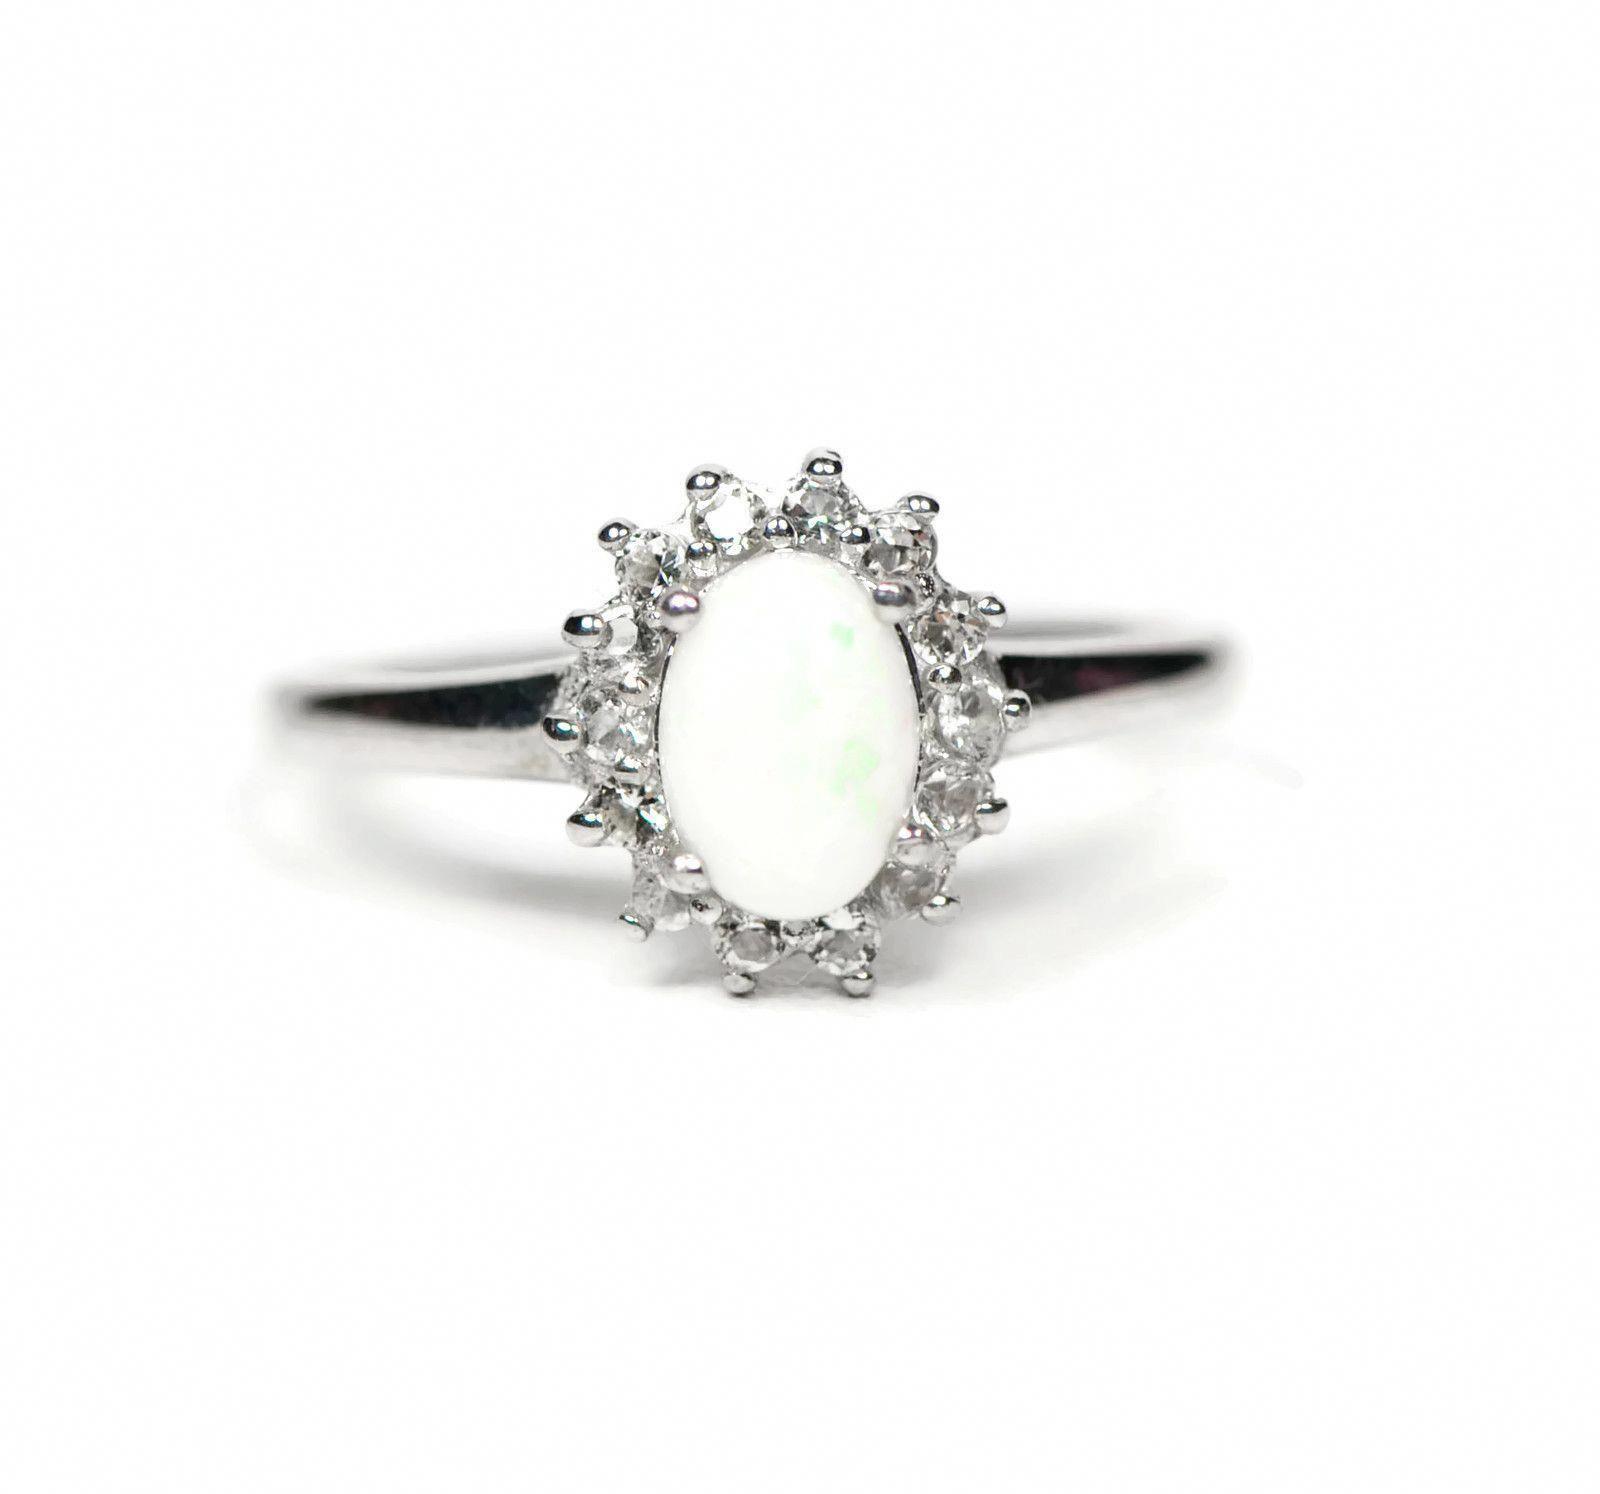 Sterling Silver White Topaz And Genuine Australian Opal Ring Engagementringsovaldainty Australian Opal Ring Opal Jewelry Opal Rings